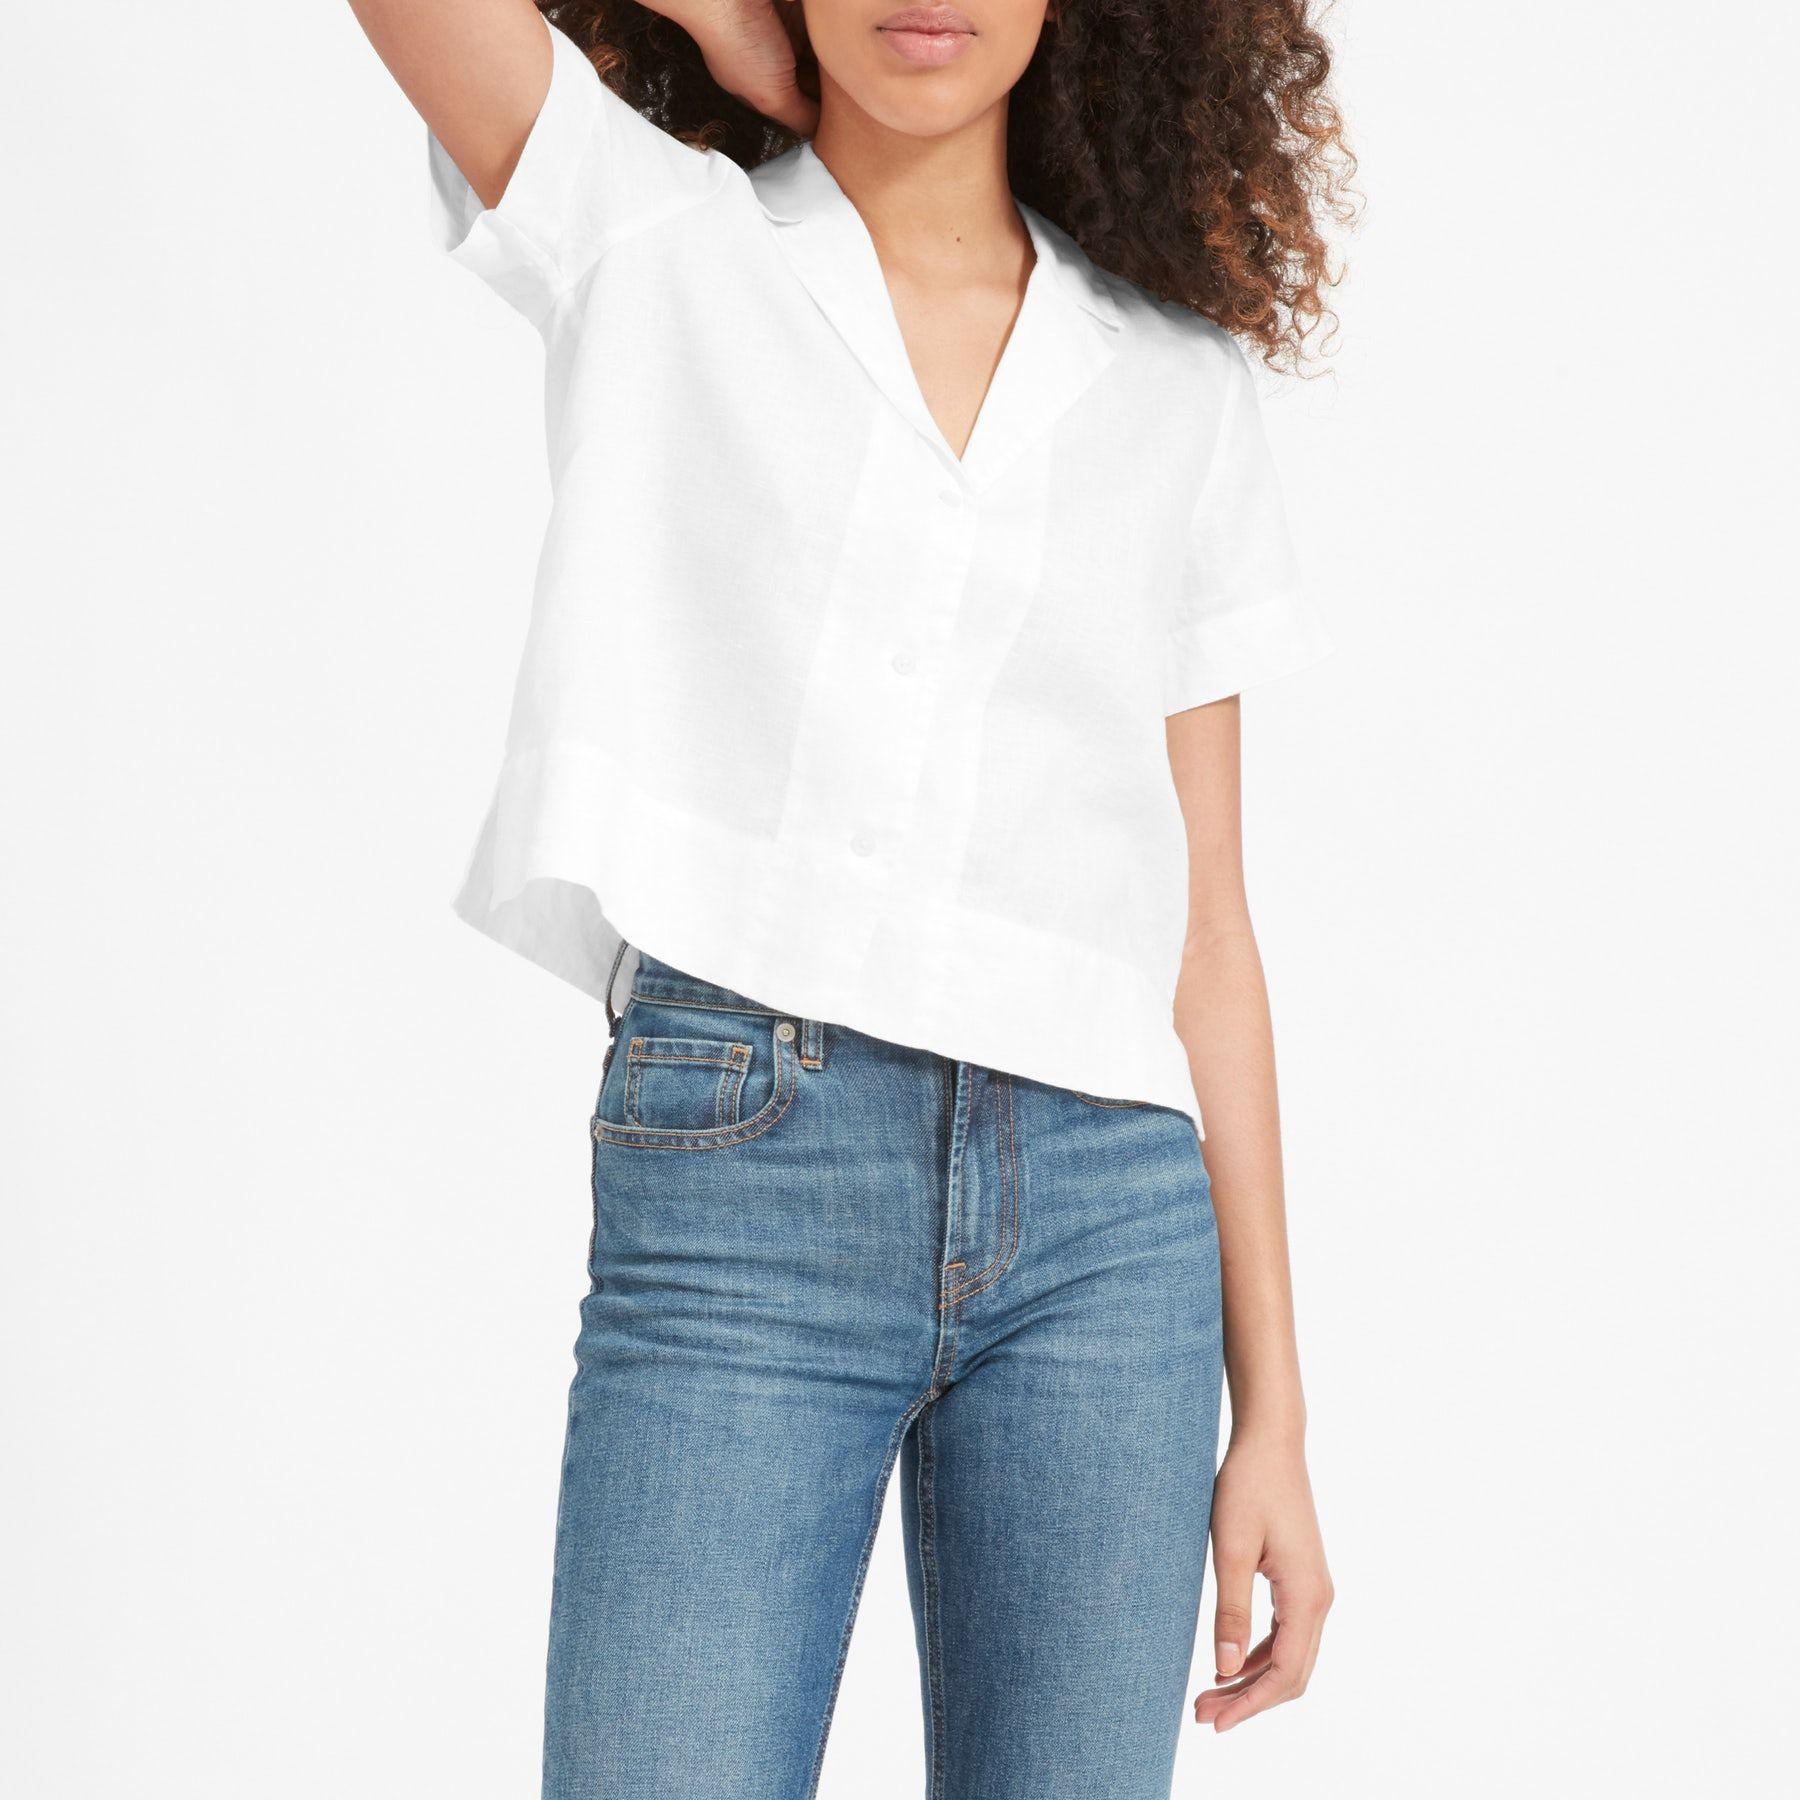 4883c7c6a6 Our Notch Collar Shirt gets a linen update. This short-sleeve shirt has a  cool notched collar